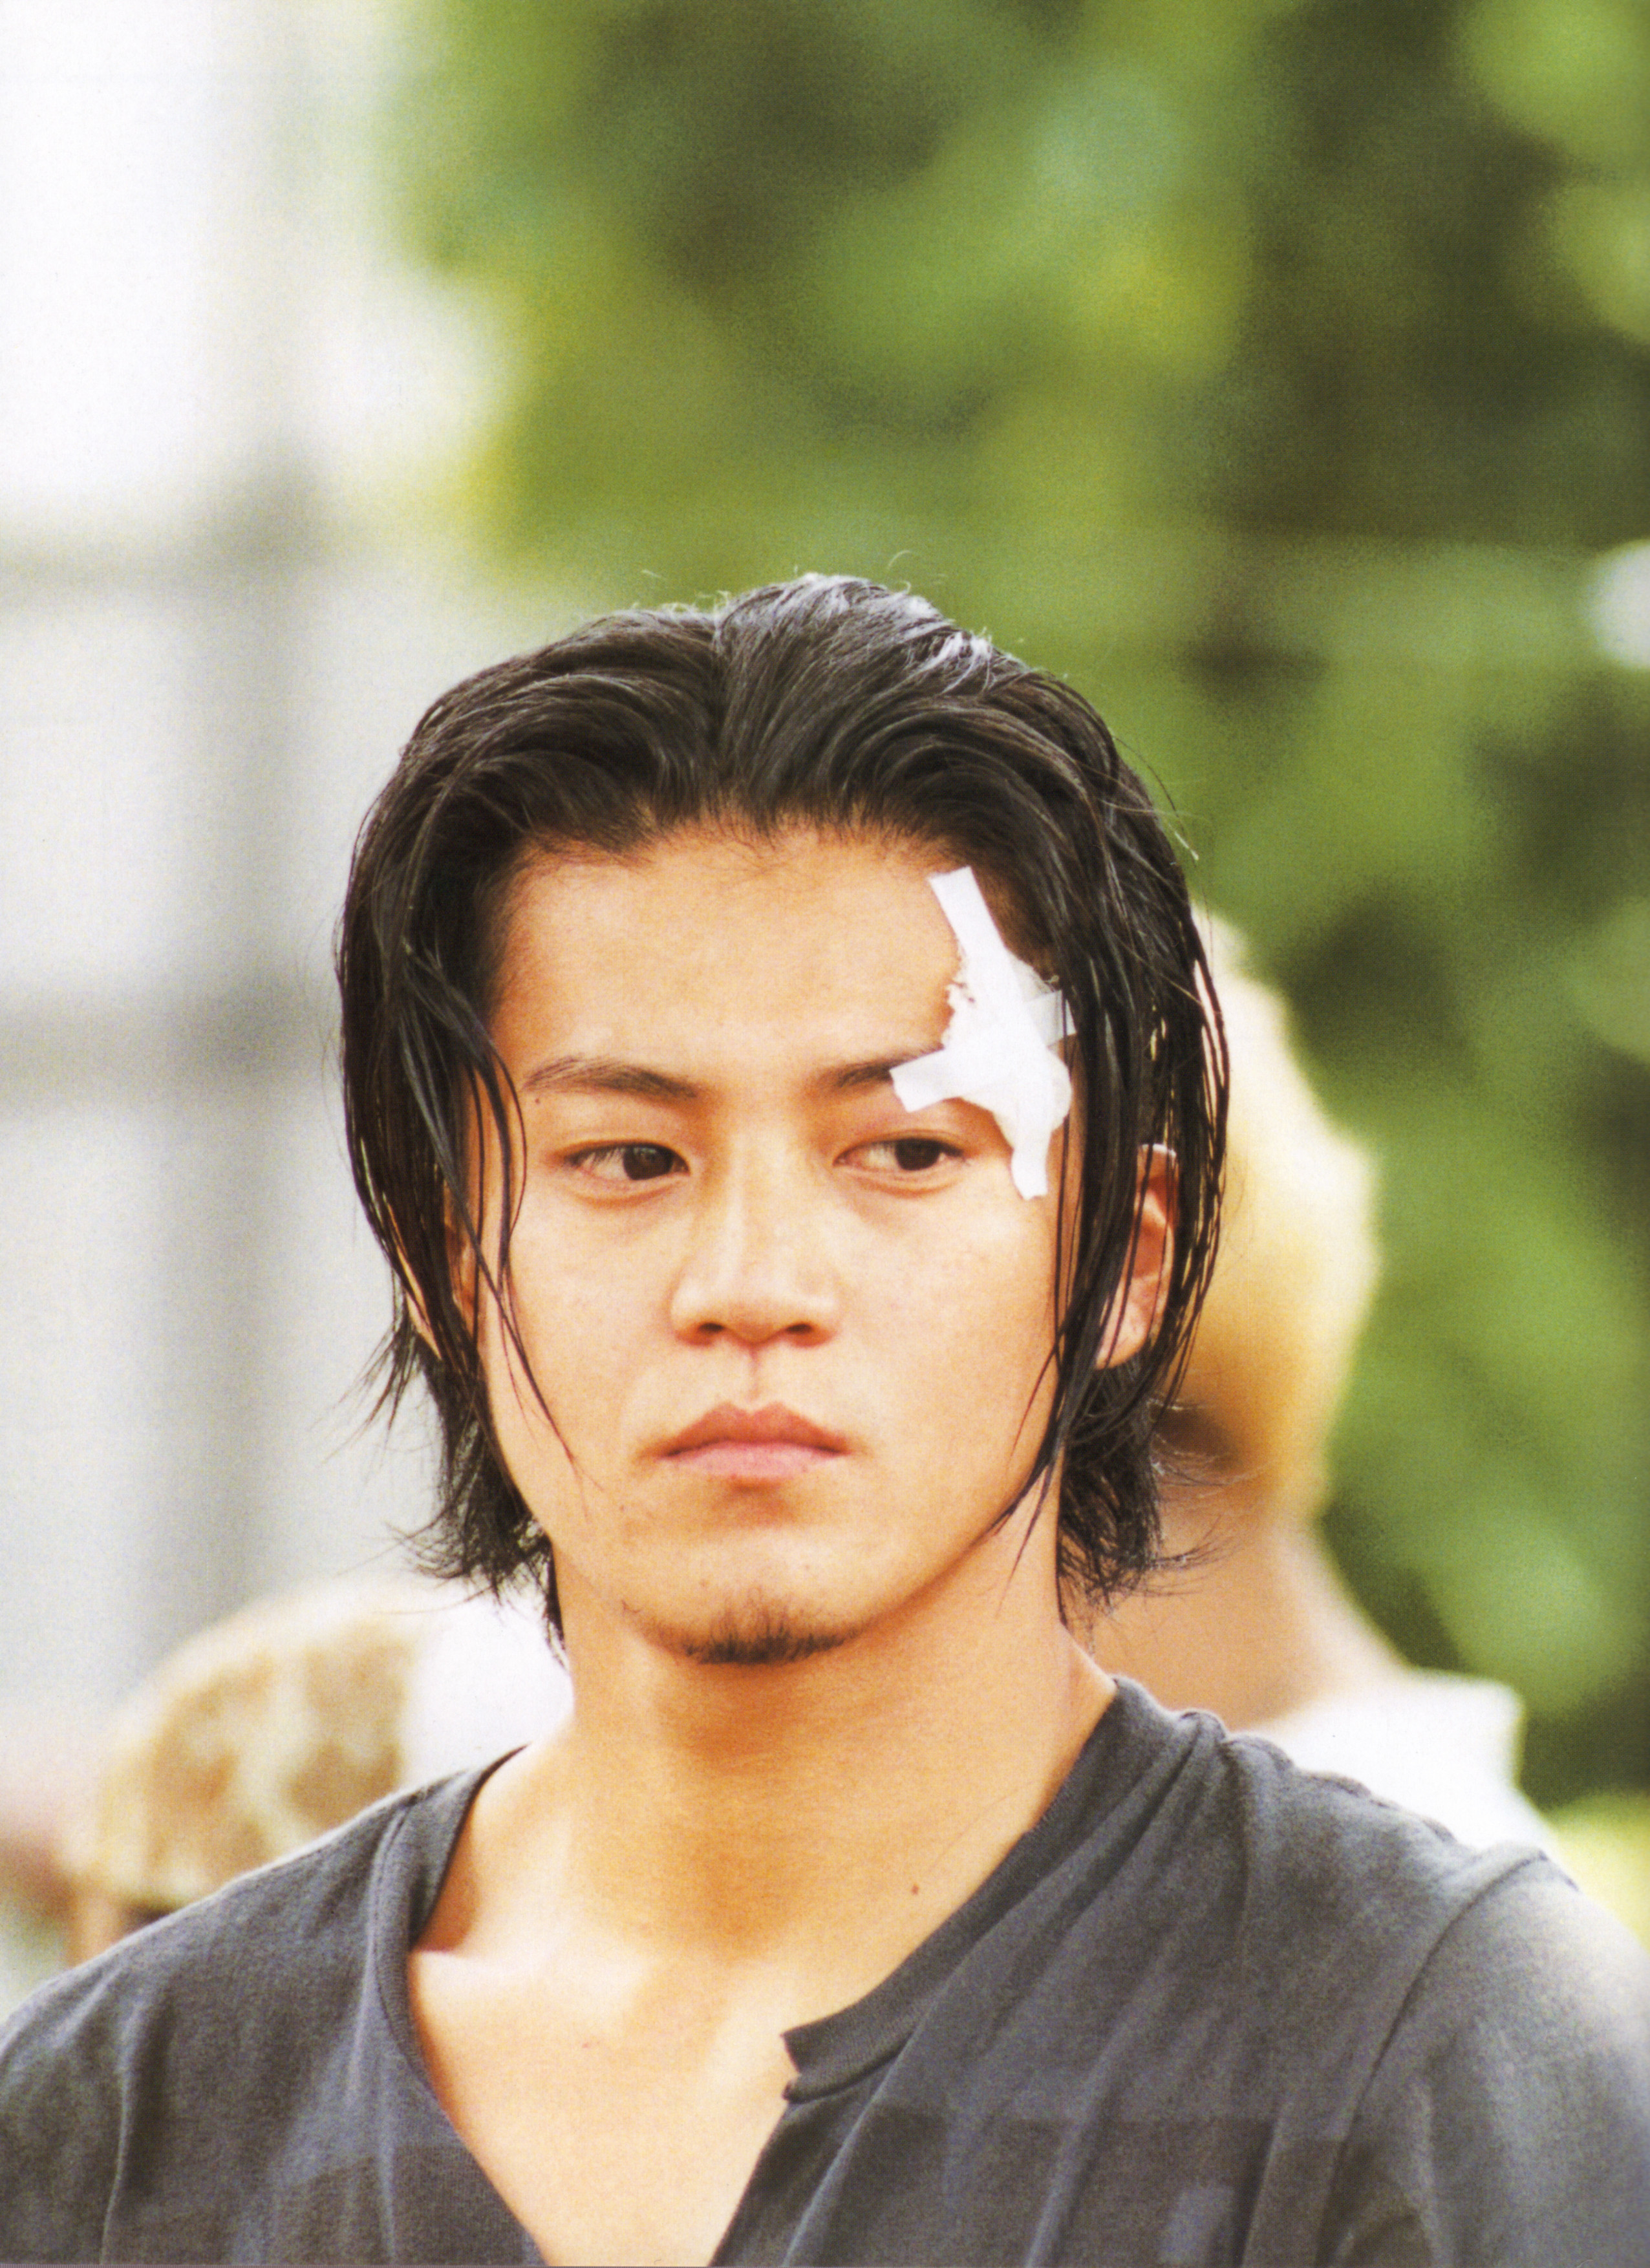 crows zero genji hairstyle